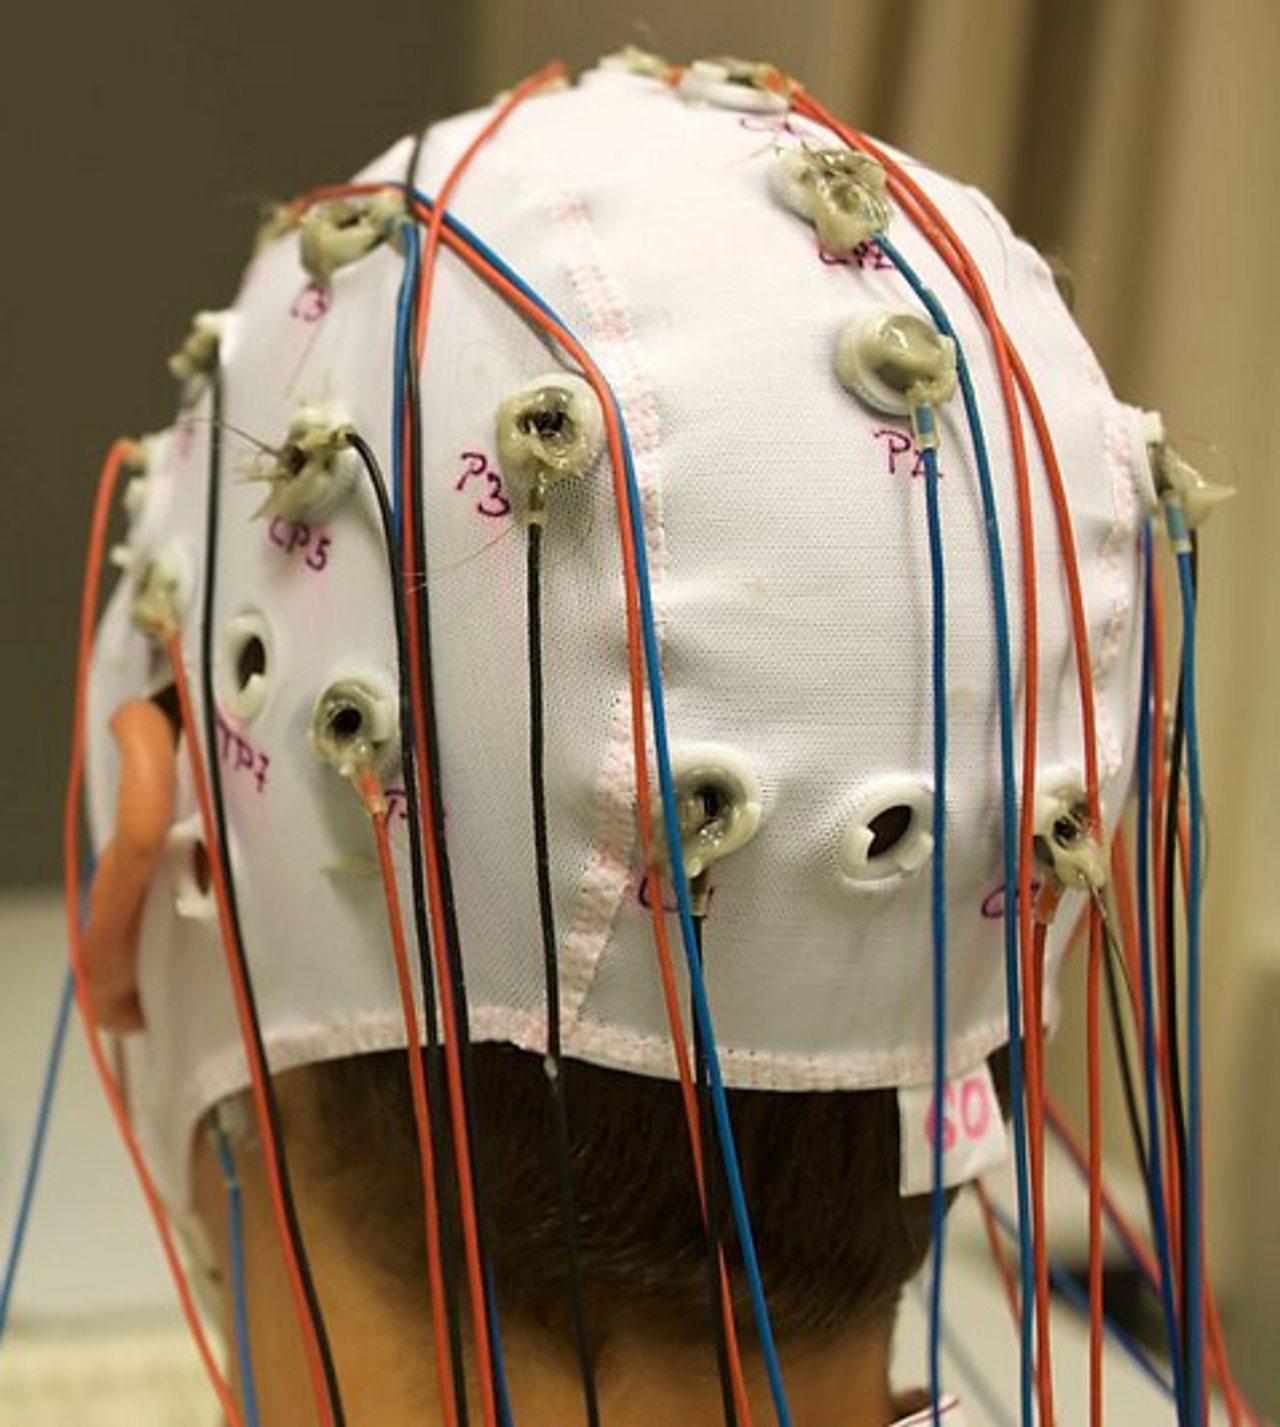 Photograph of man with an electroencephalogram (EEG) on his head.